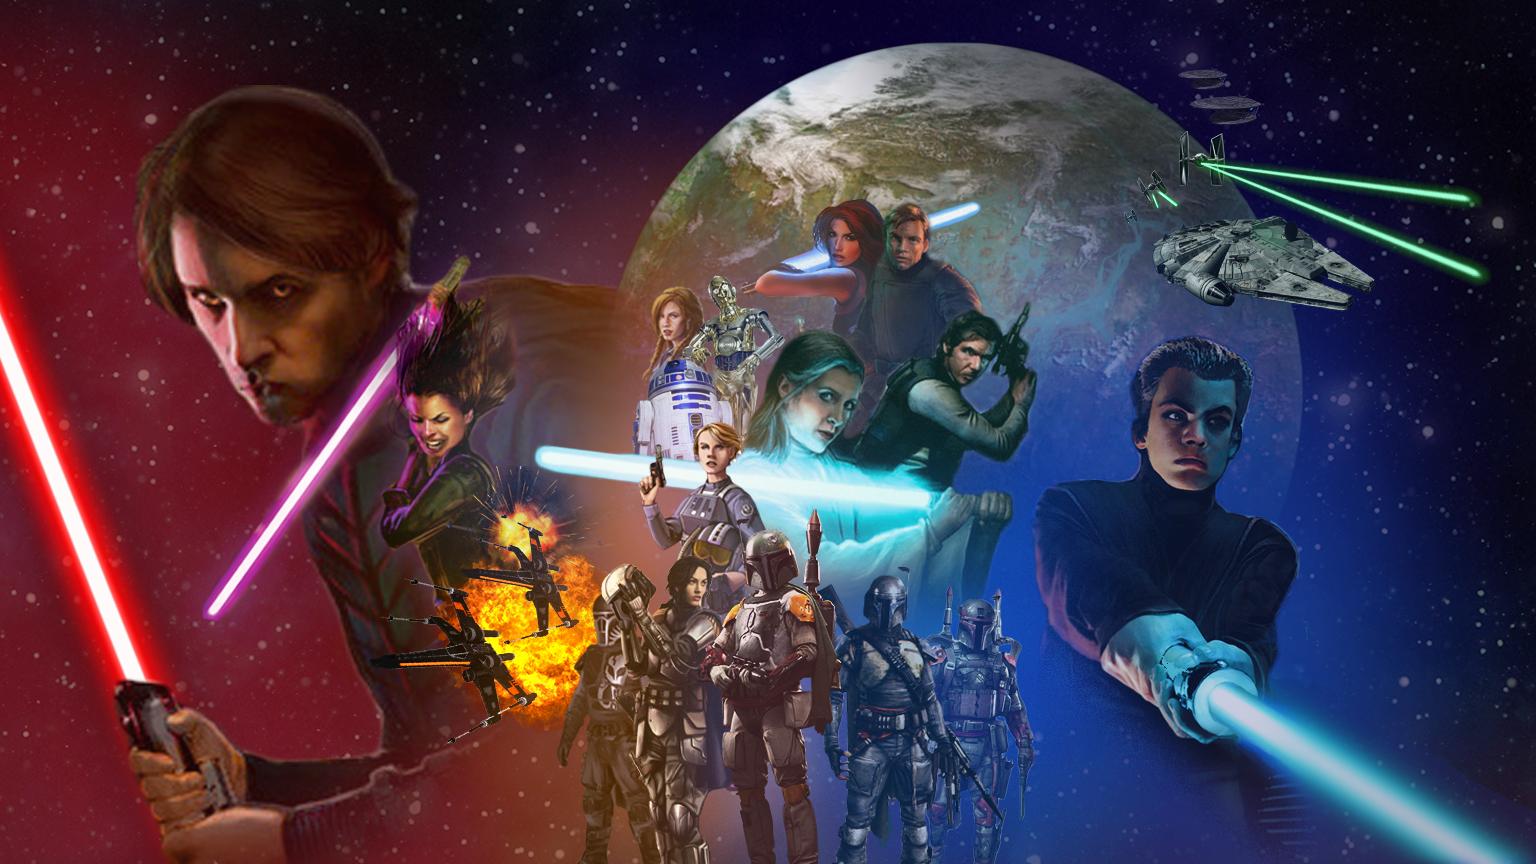 The Force Awakens Wallpaper - HD Wallpaper